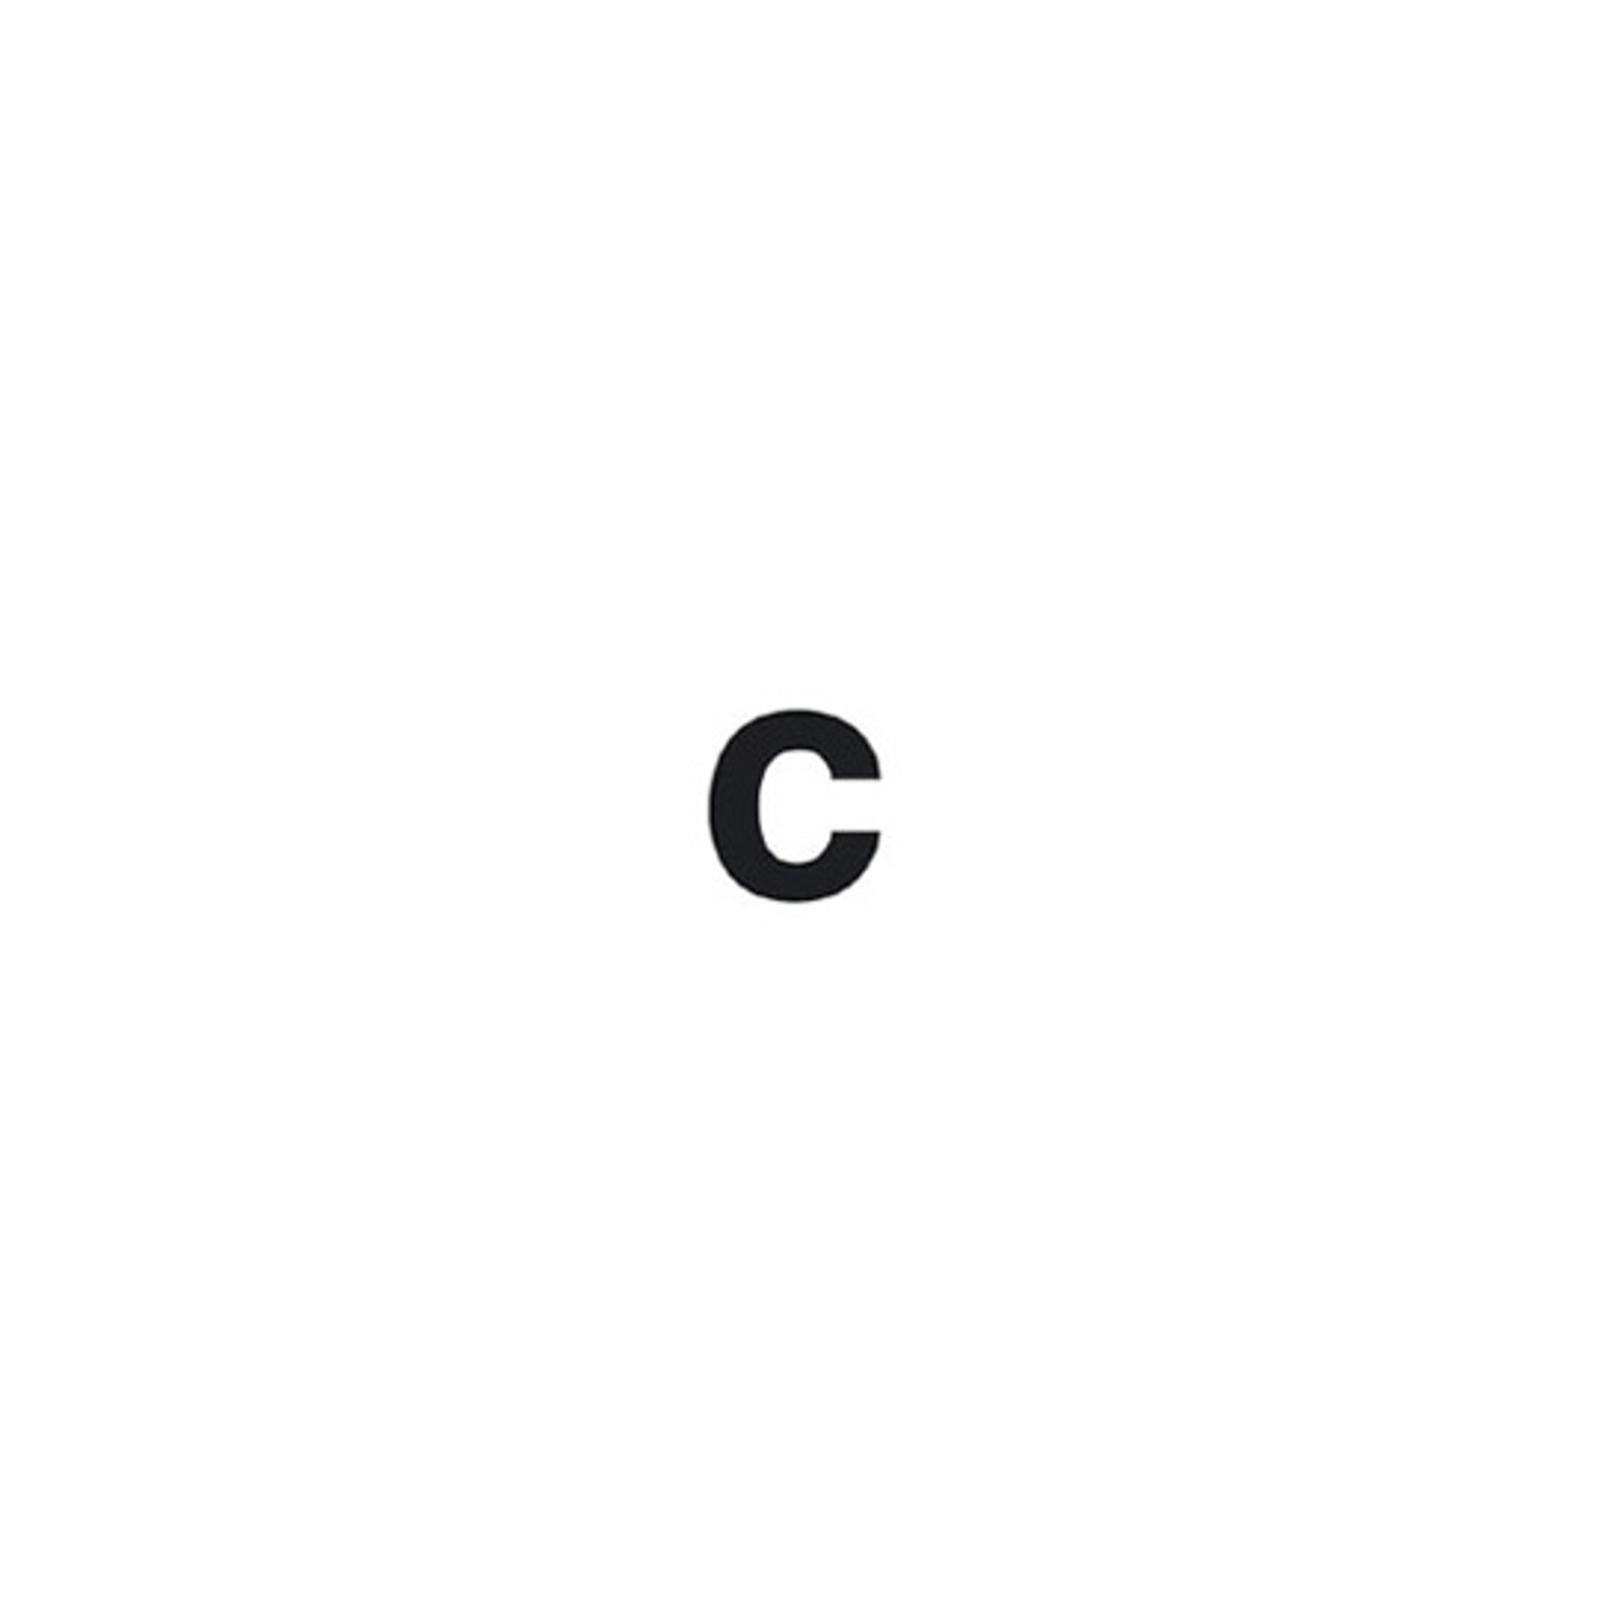 Selbstklebende Ziffer c